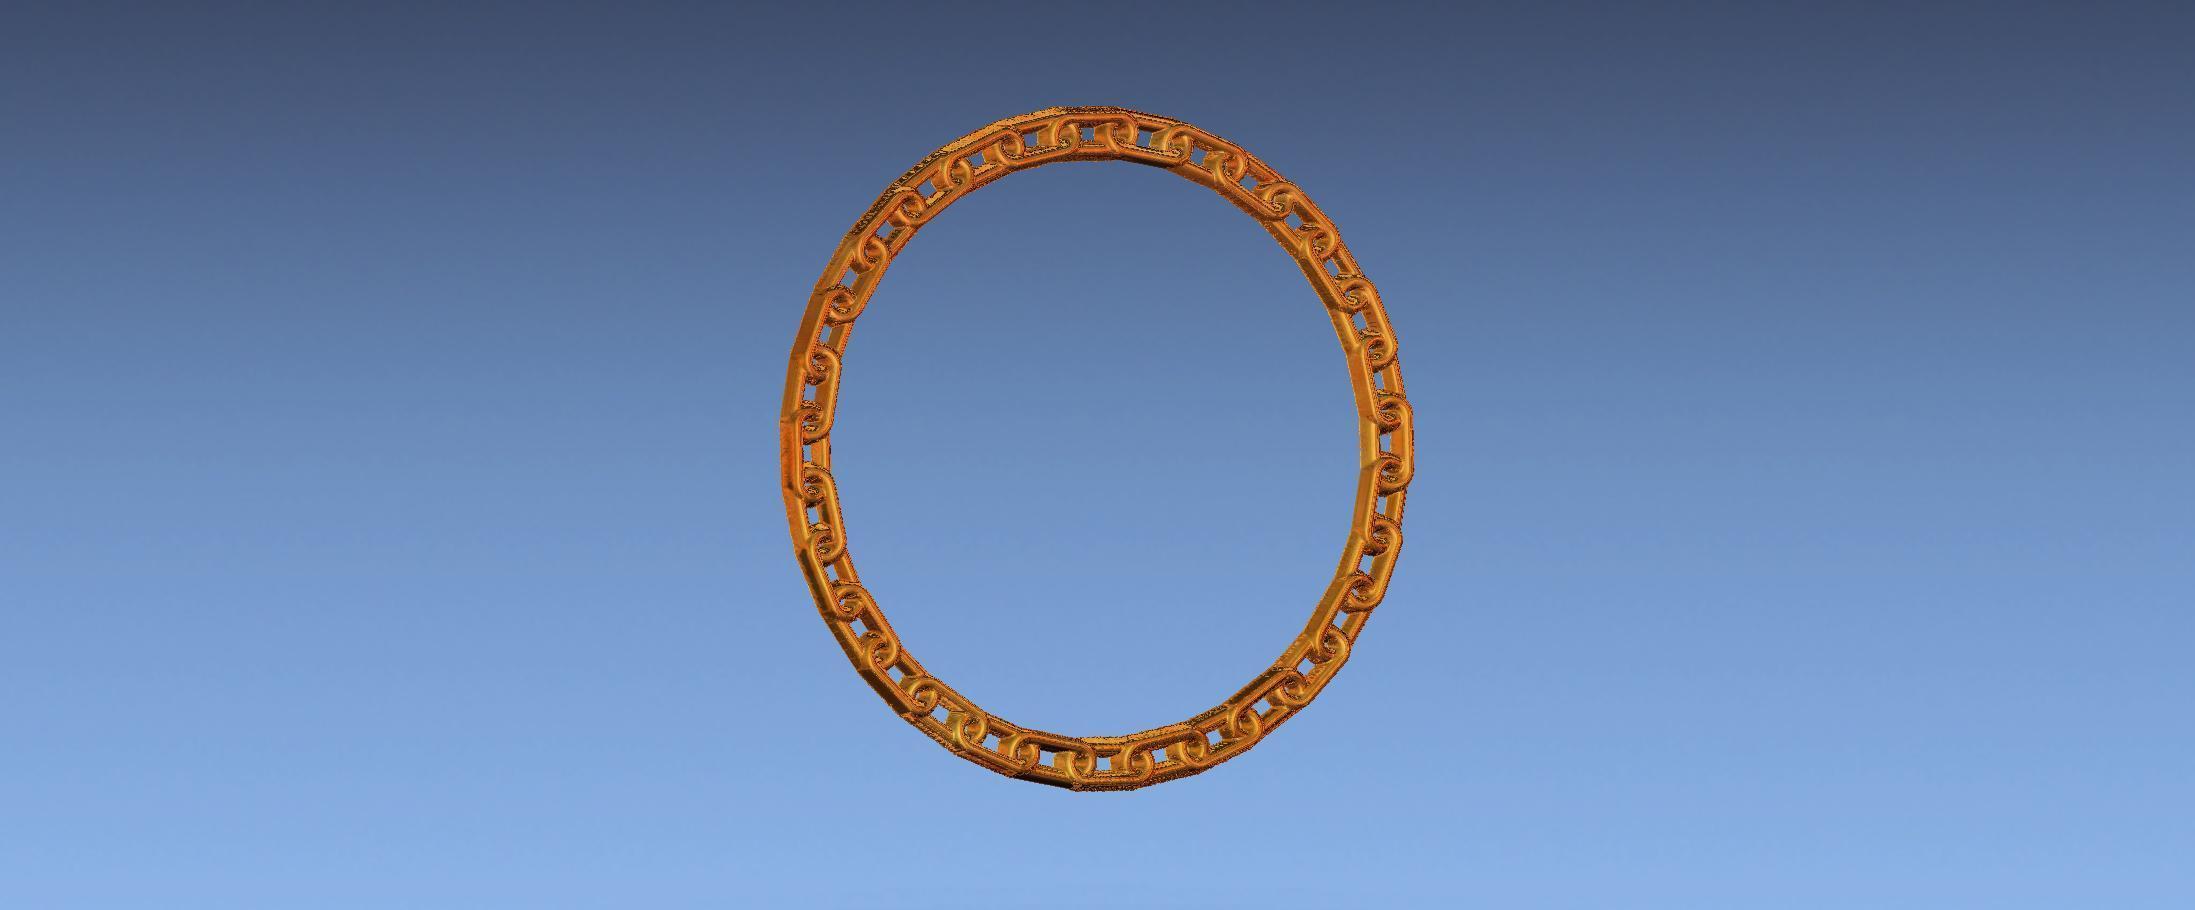 2.jpg Download free STL file chain border 3d stl file • 3D printing design, ALPHA_MENA